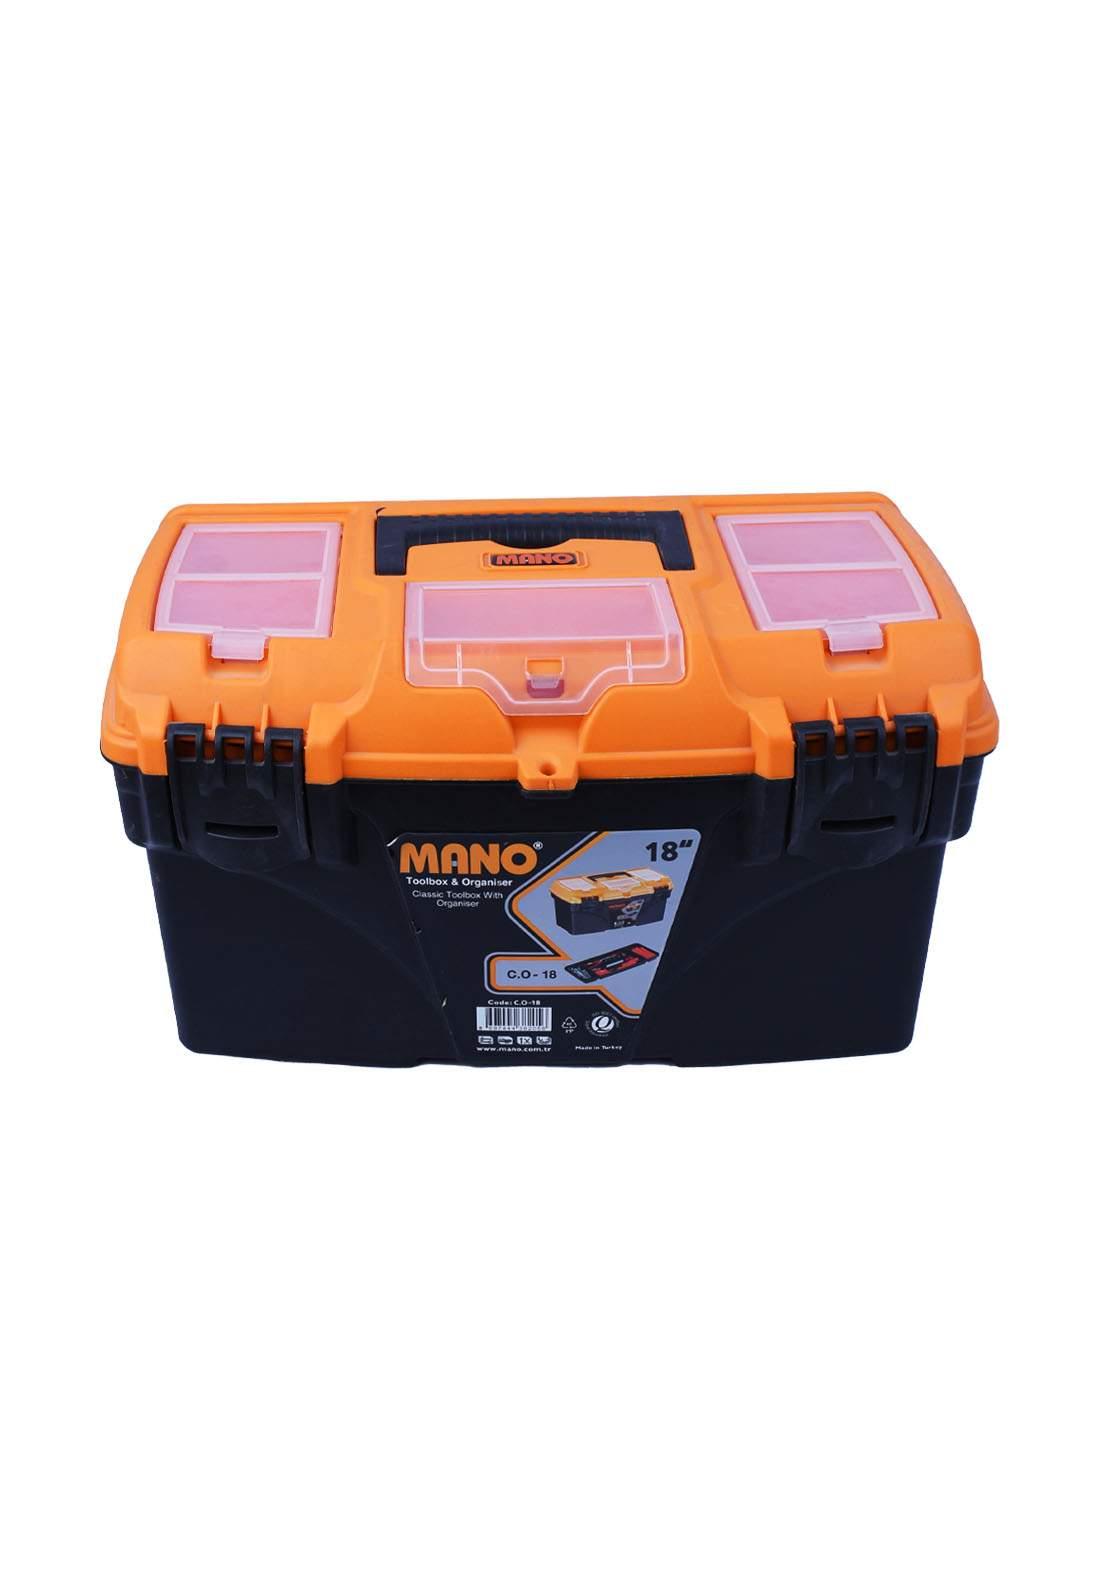 "Mano Co-18 18"" Classic Tool Bag With Organizer حقيبة عدد يدوية"